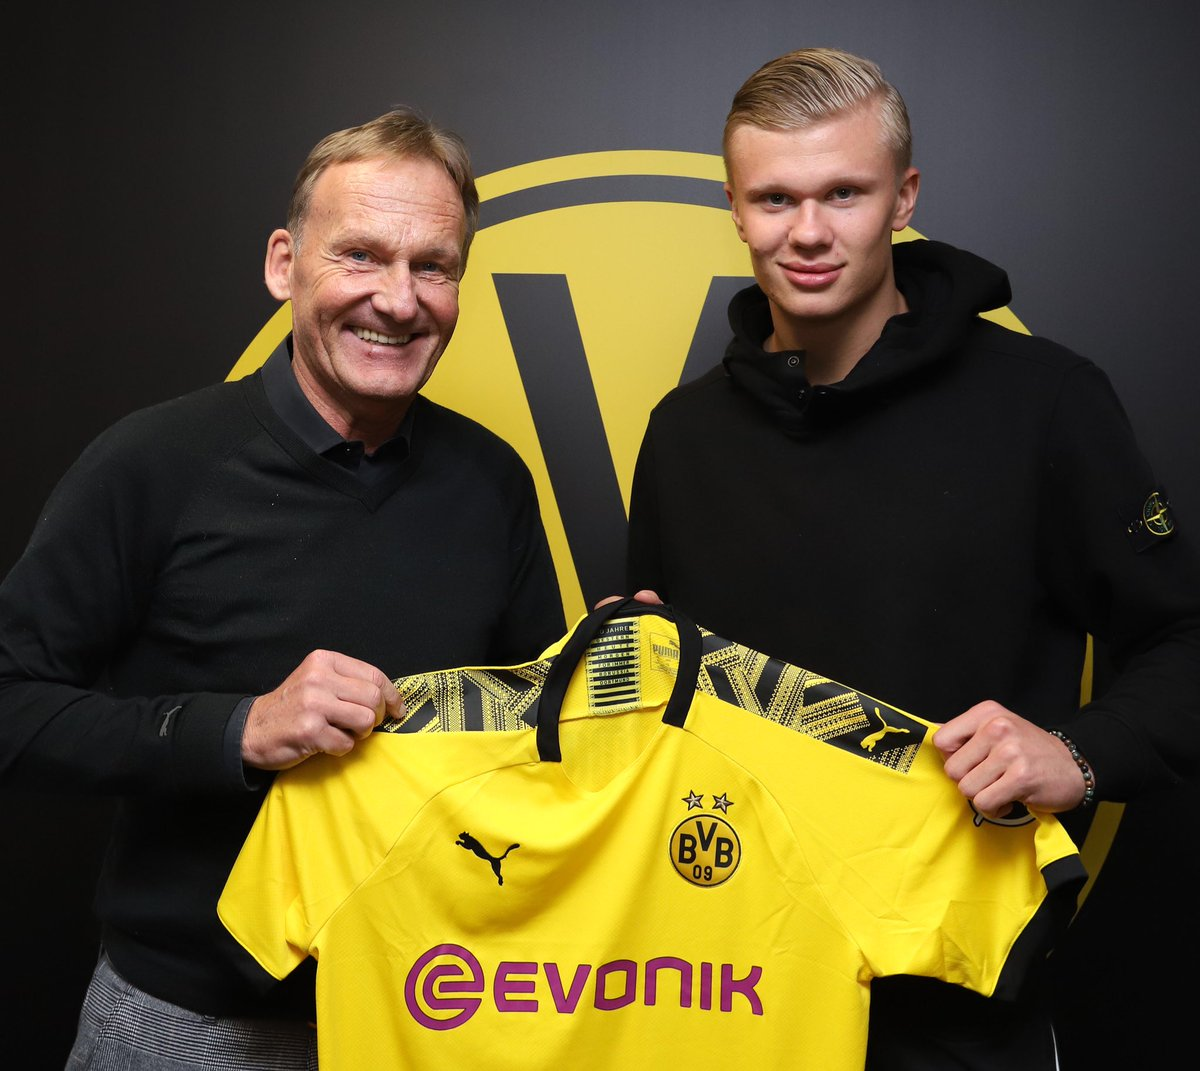 Borussia Dortmund Confirms Haaland Signing From RB Salzburg